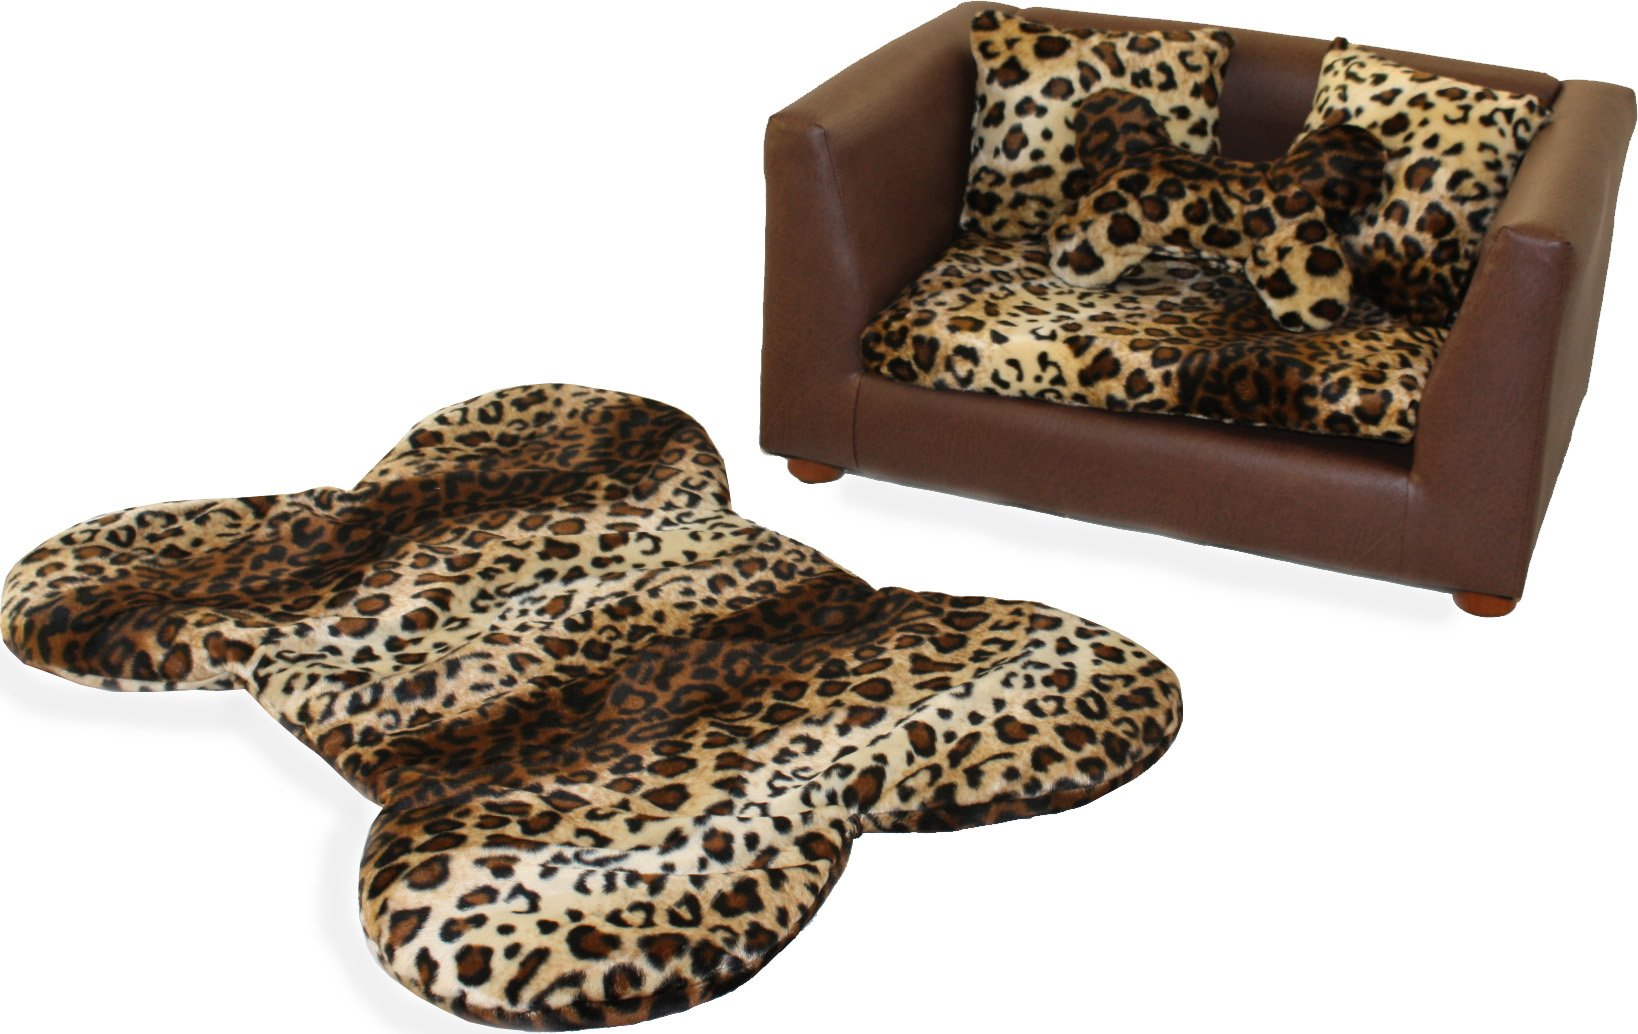 Keet Deluxe Orthopedic Memory Foam Dog Bed Set, Small, Leopard